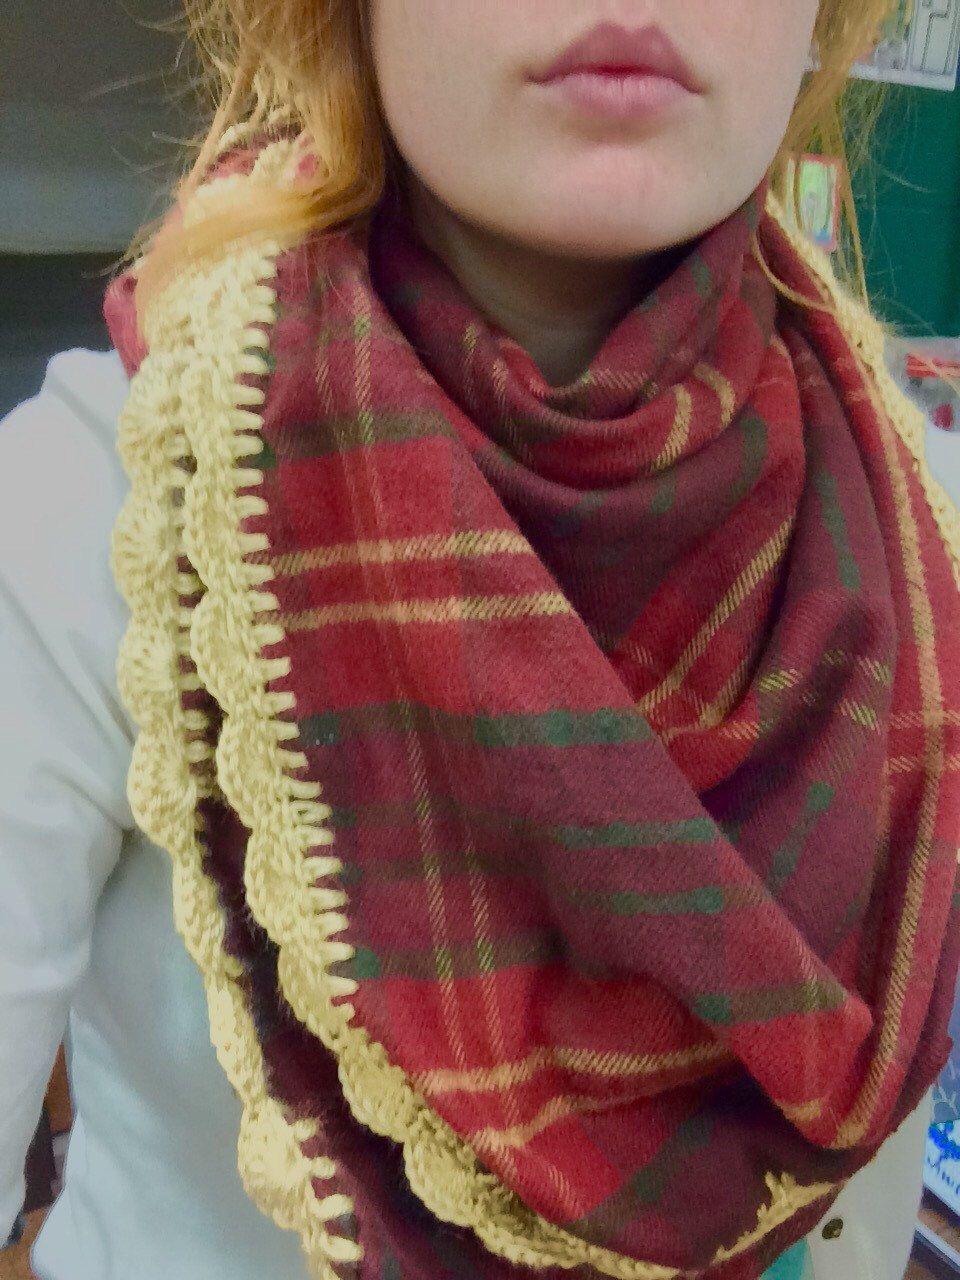 Hank's Blanket Scarf by Hookopotomus on Etsy https://www.etsy.com/listing/253993710/hanks-blanket-scarf